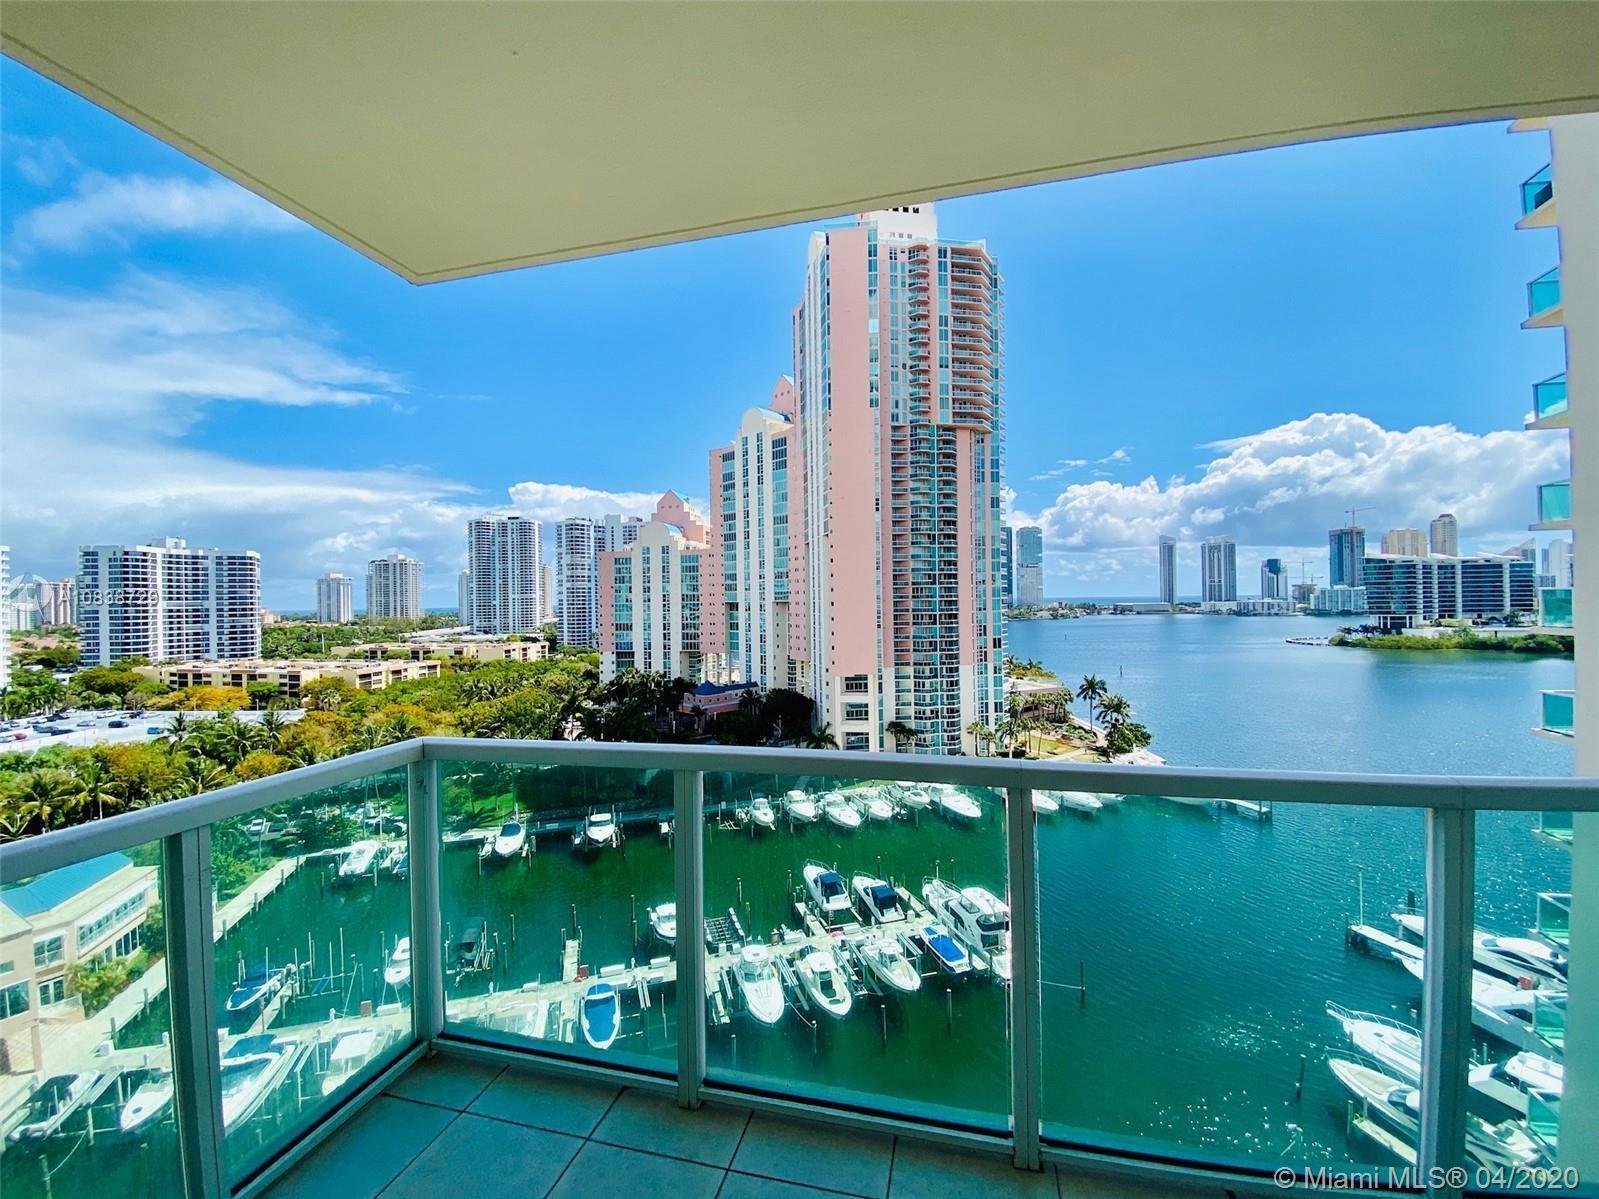 Aventura Marina 1 bright corner unit with stunning water views of bay, intracoastal and ocean. Large